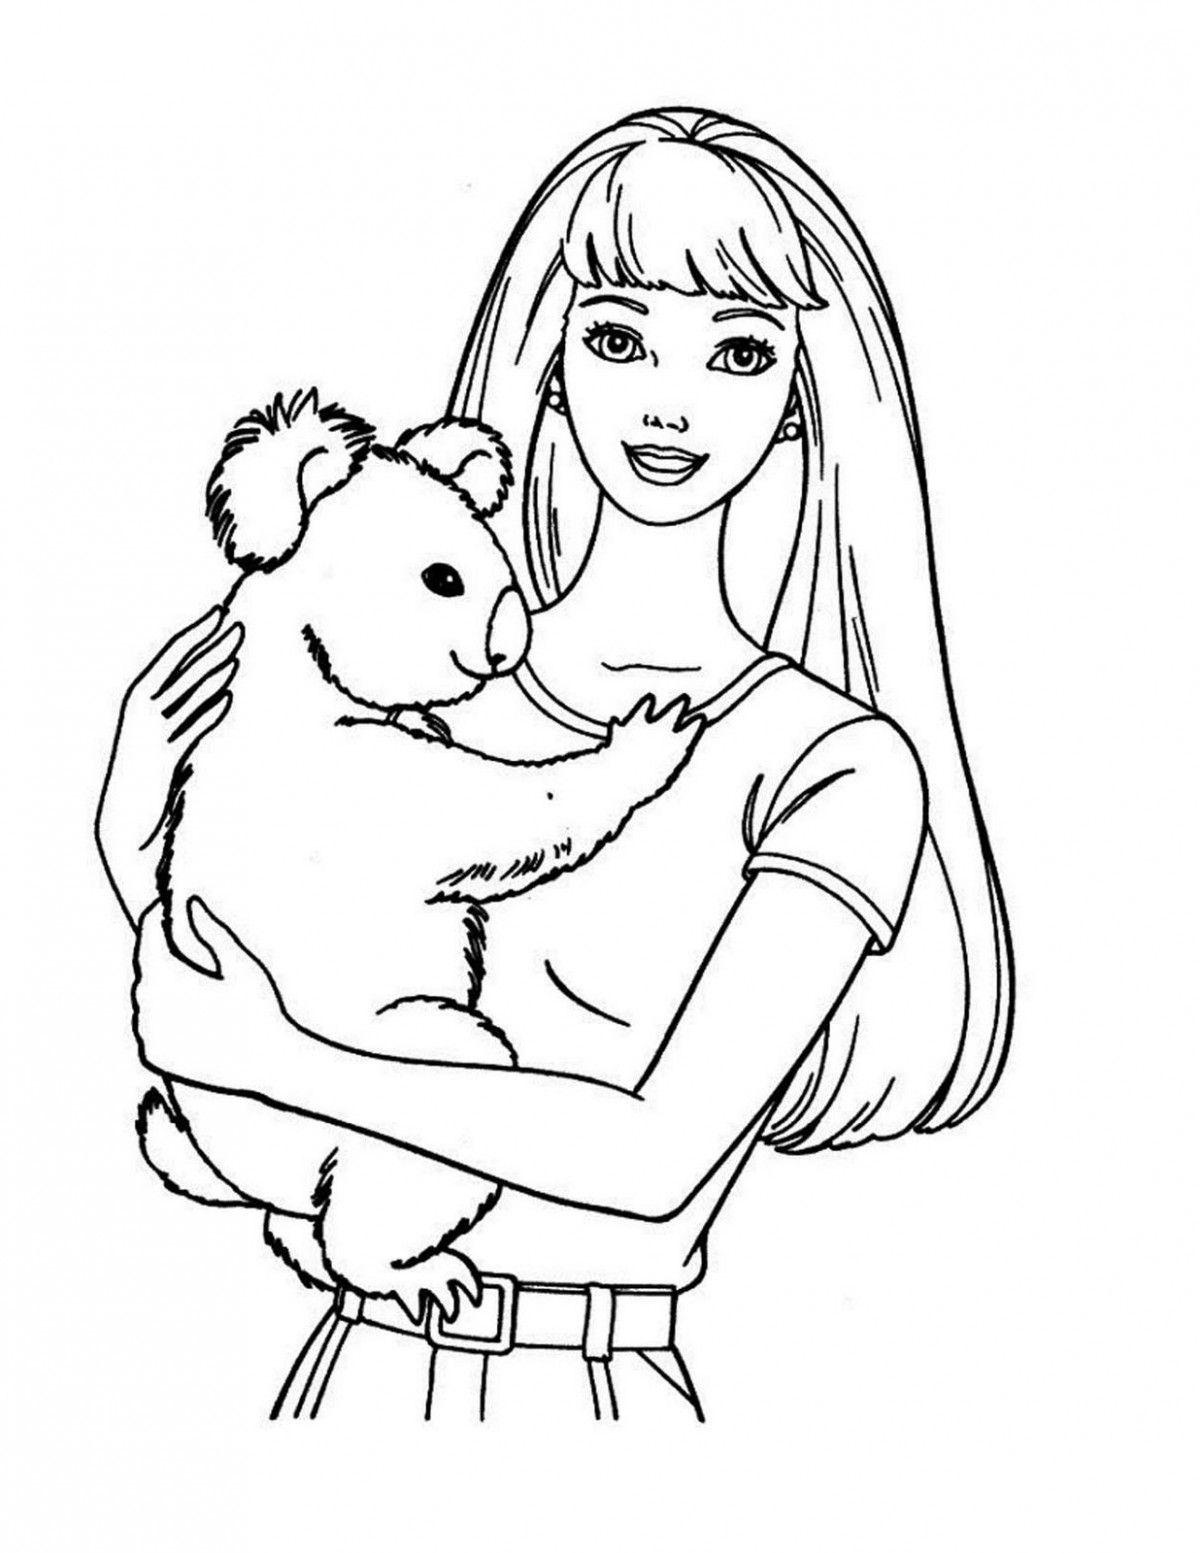 Barbie Holding A Koala Disney Princess Coloring Pages Princess Coloring Pages Unicorn Coloring Pages